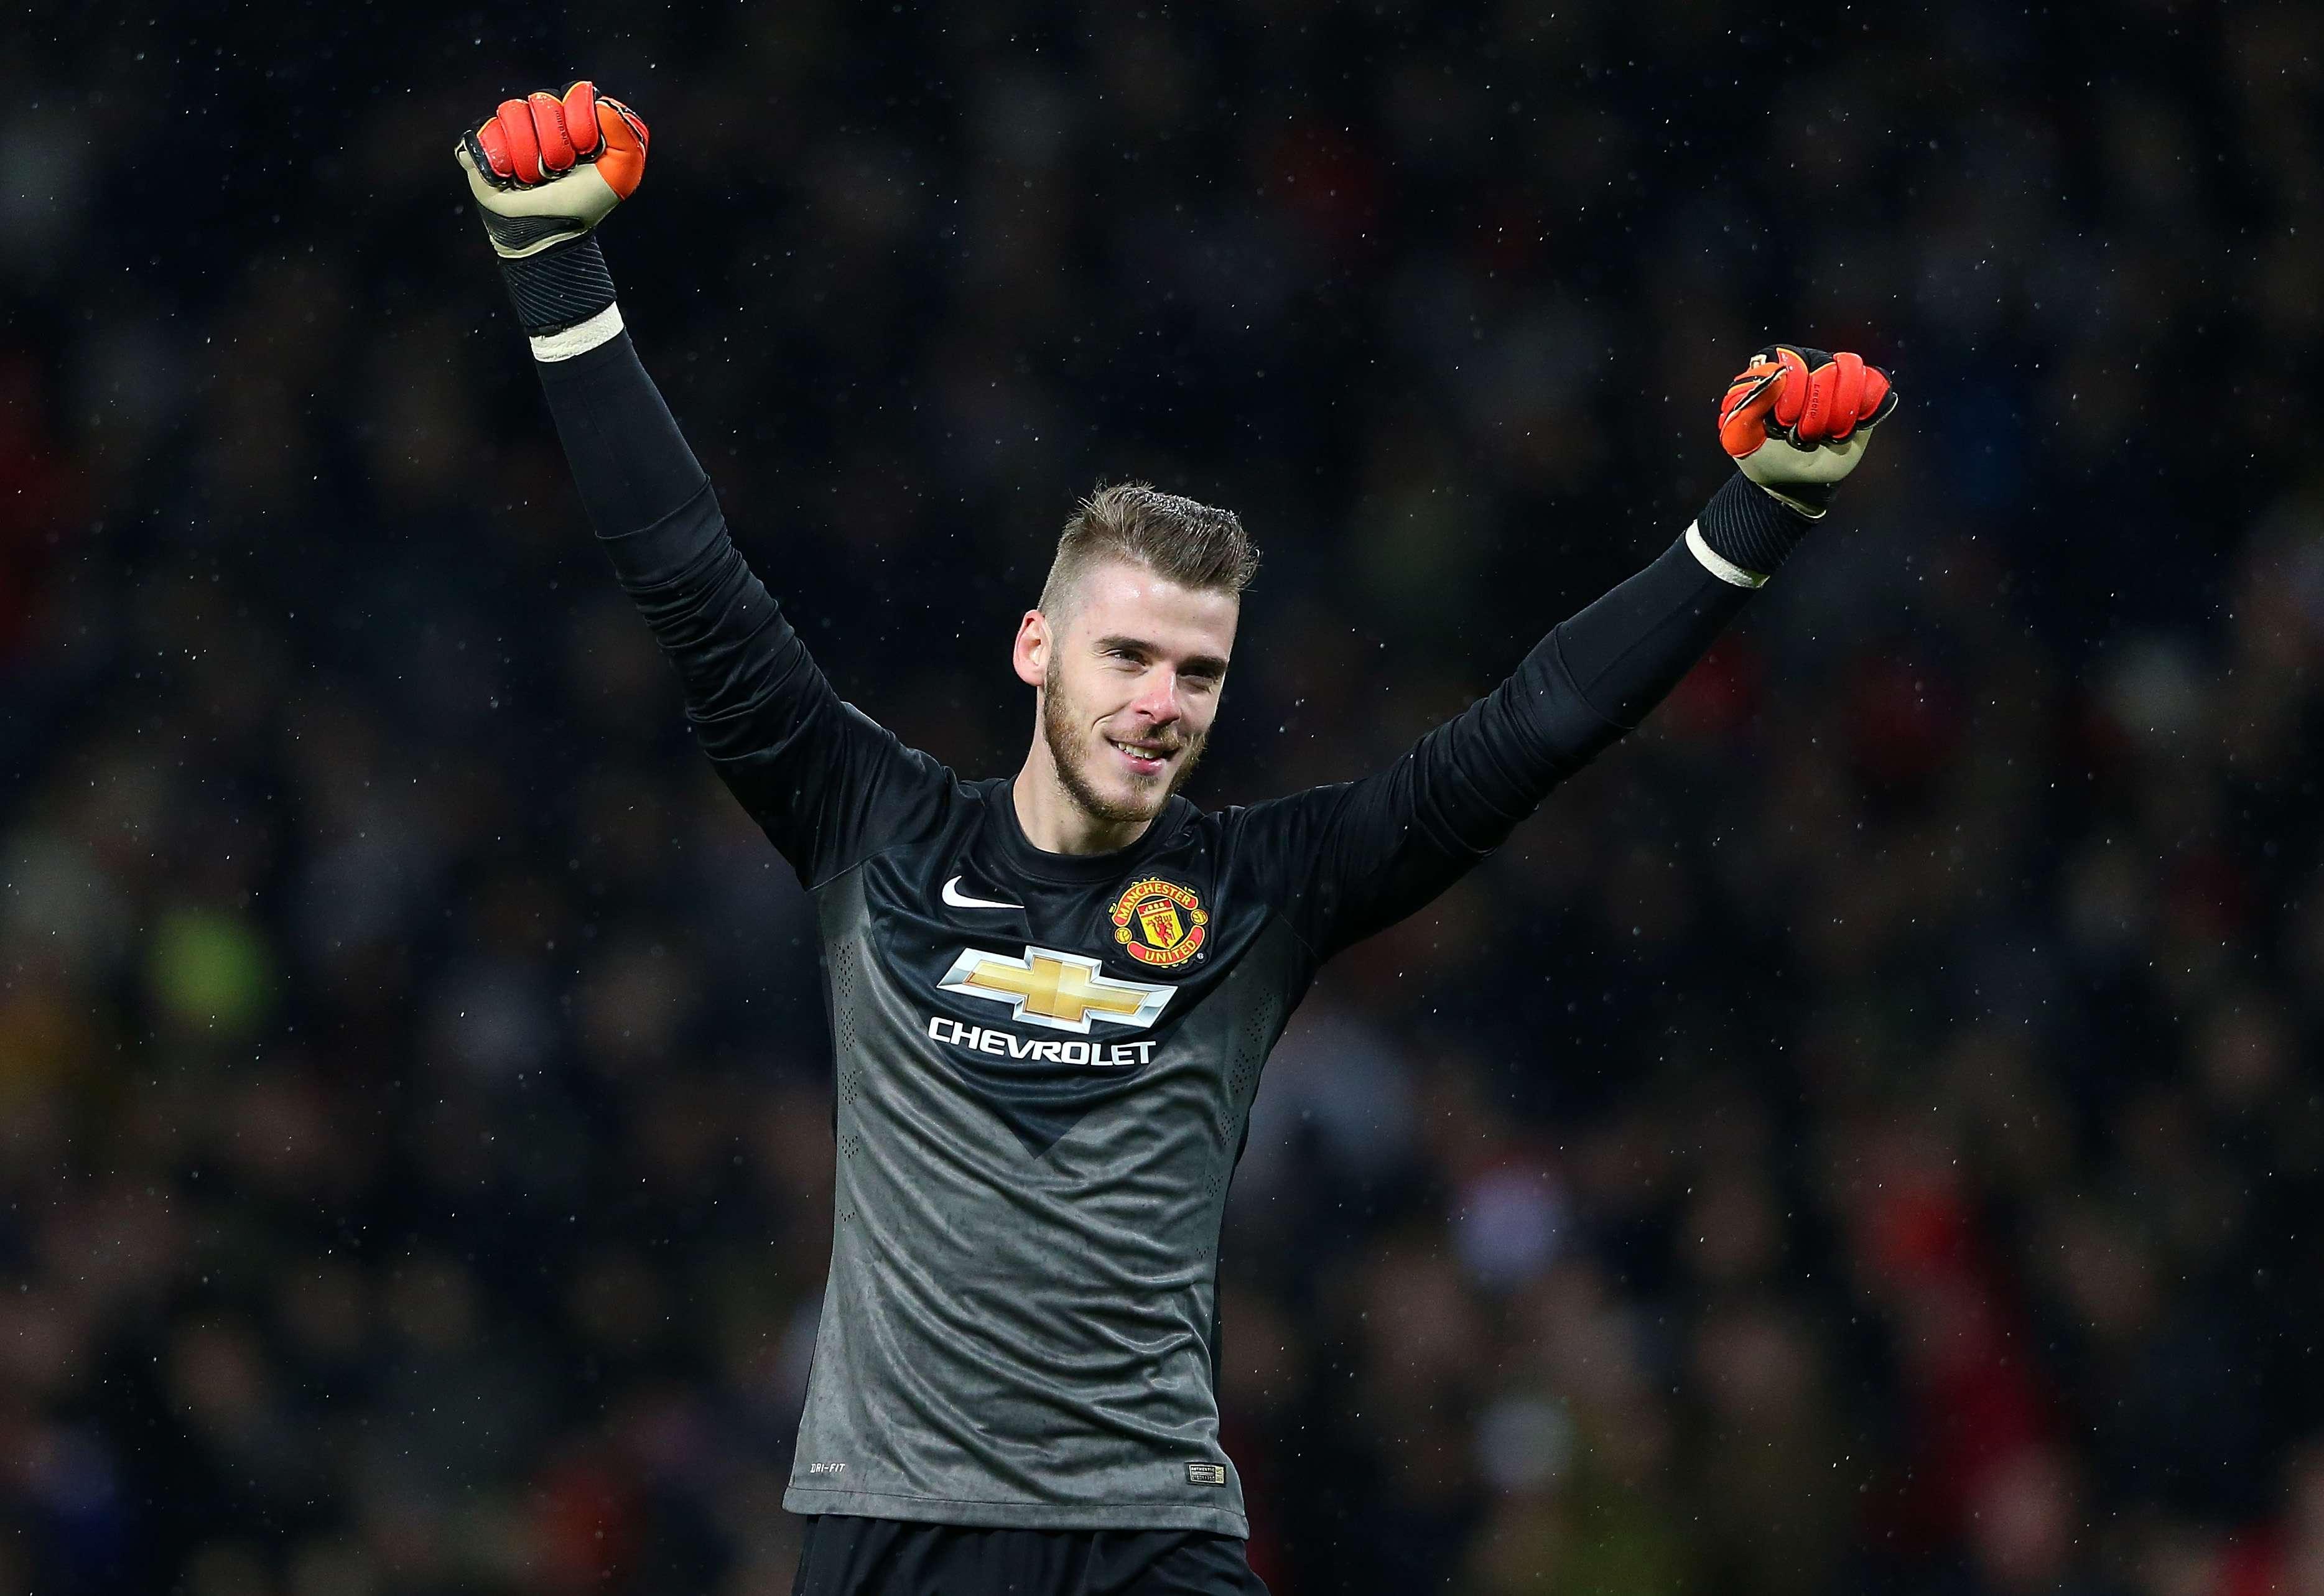 De Gea, portero del Manchester United pero pretendido por el Real Madrid. Foto: Getty Images